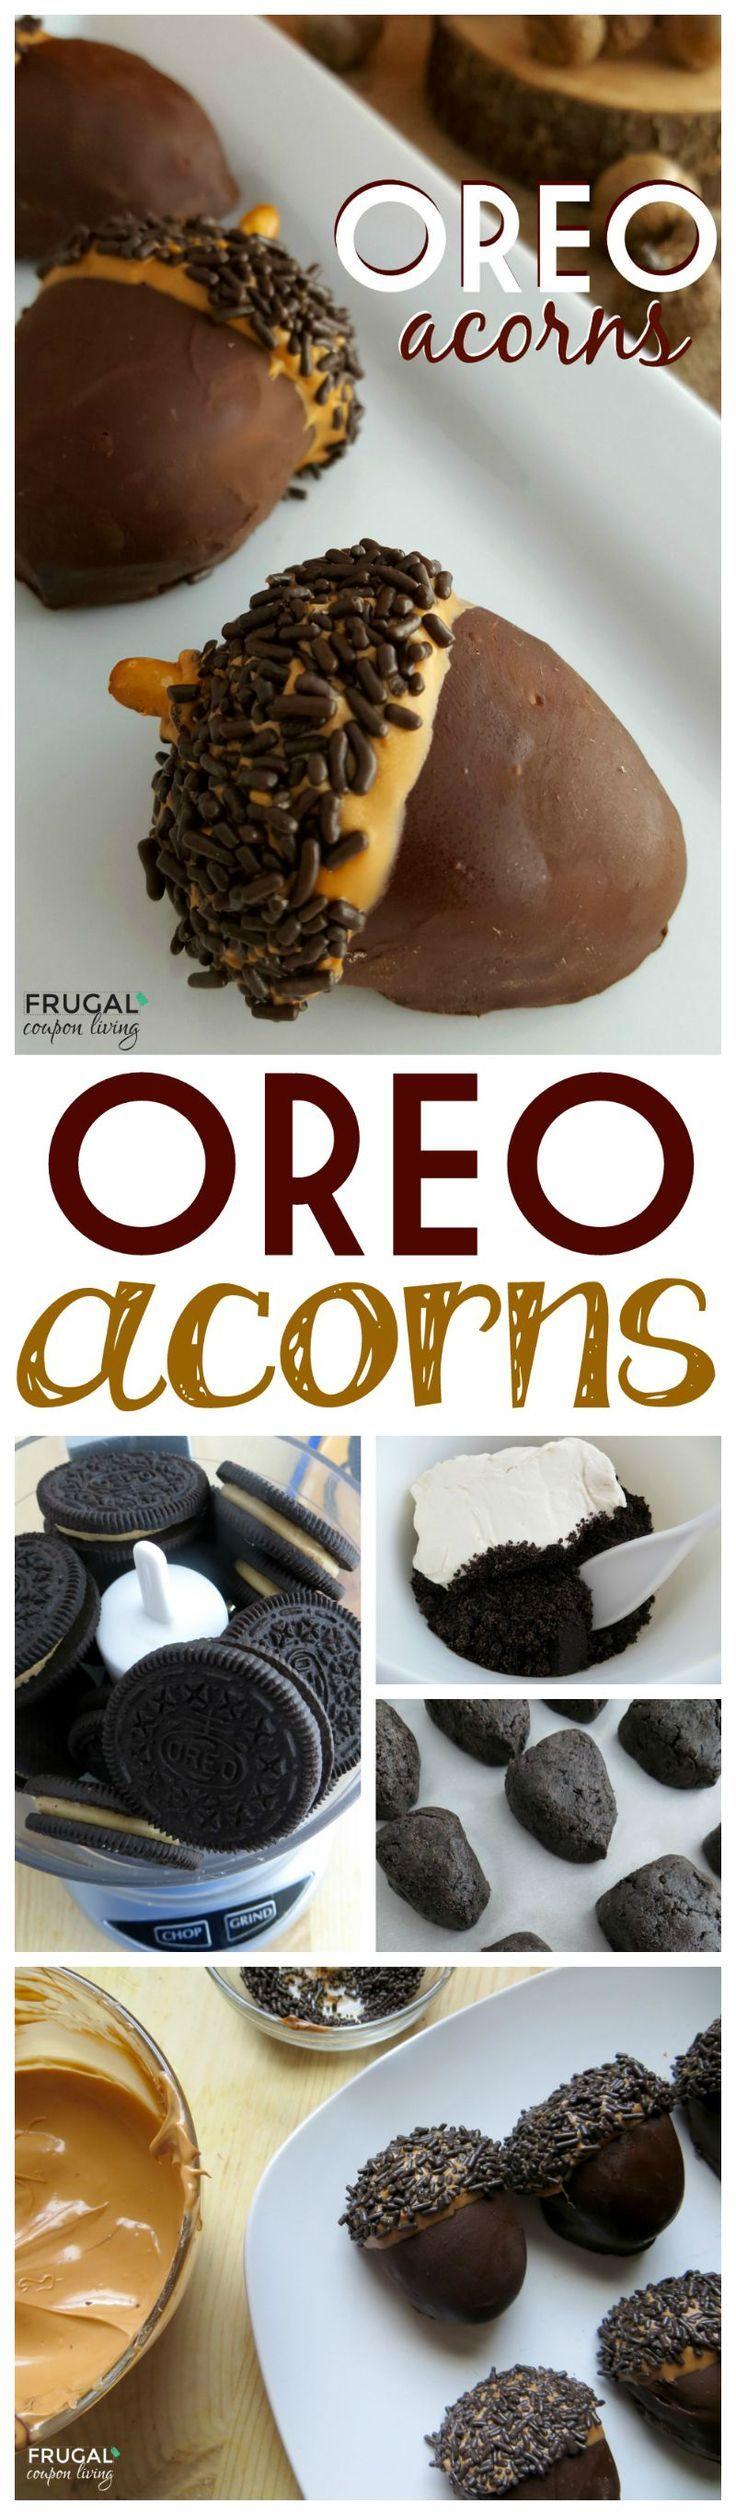 Kid's Food Craft - Edible OREO Acorns